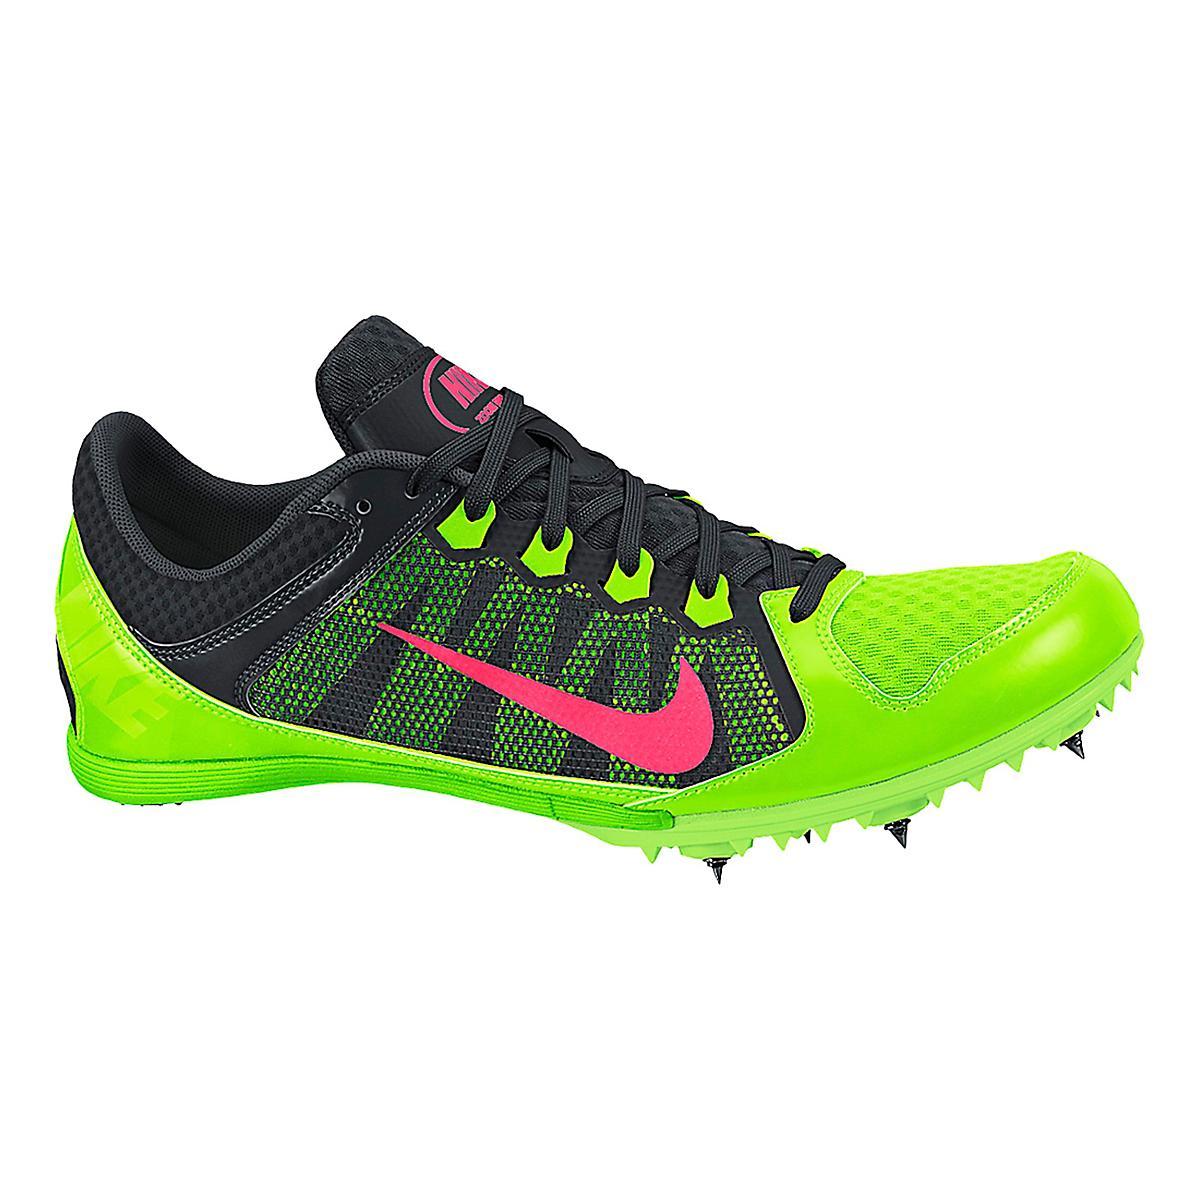 känt märke billig stabil kvalitet Mens Nike Zoom Rival MD 7 Track and Field Shoe at Road Runner Sports